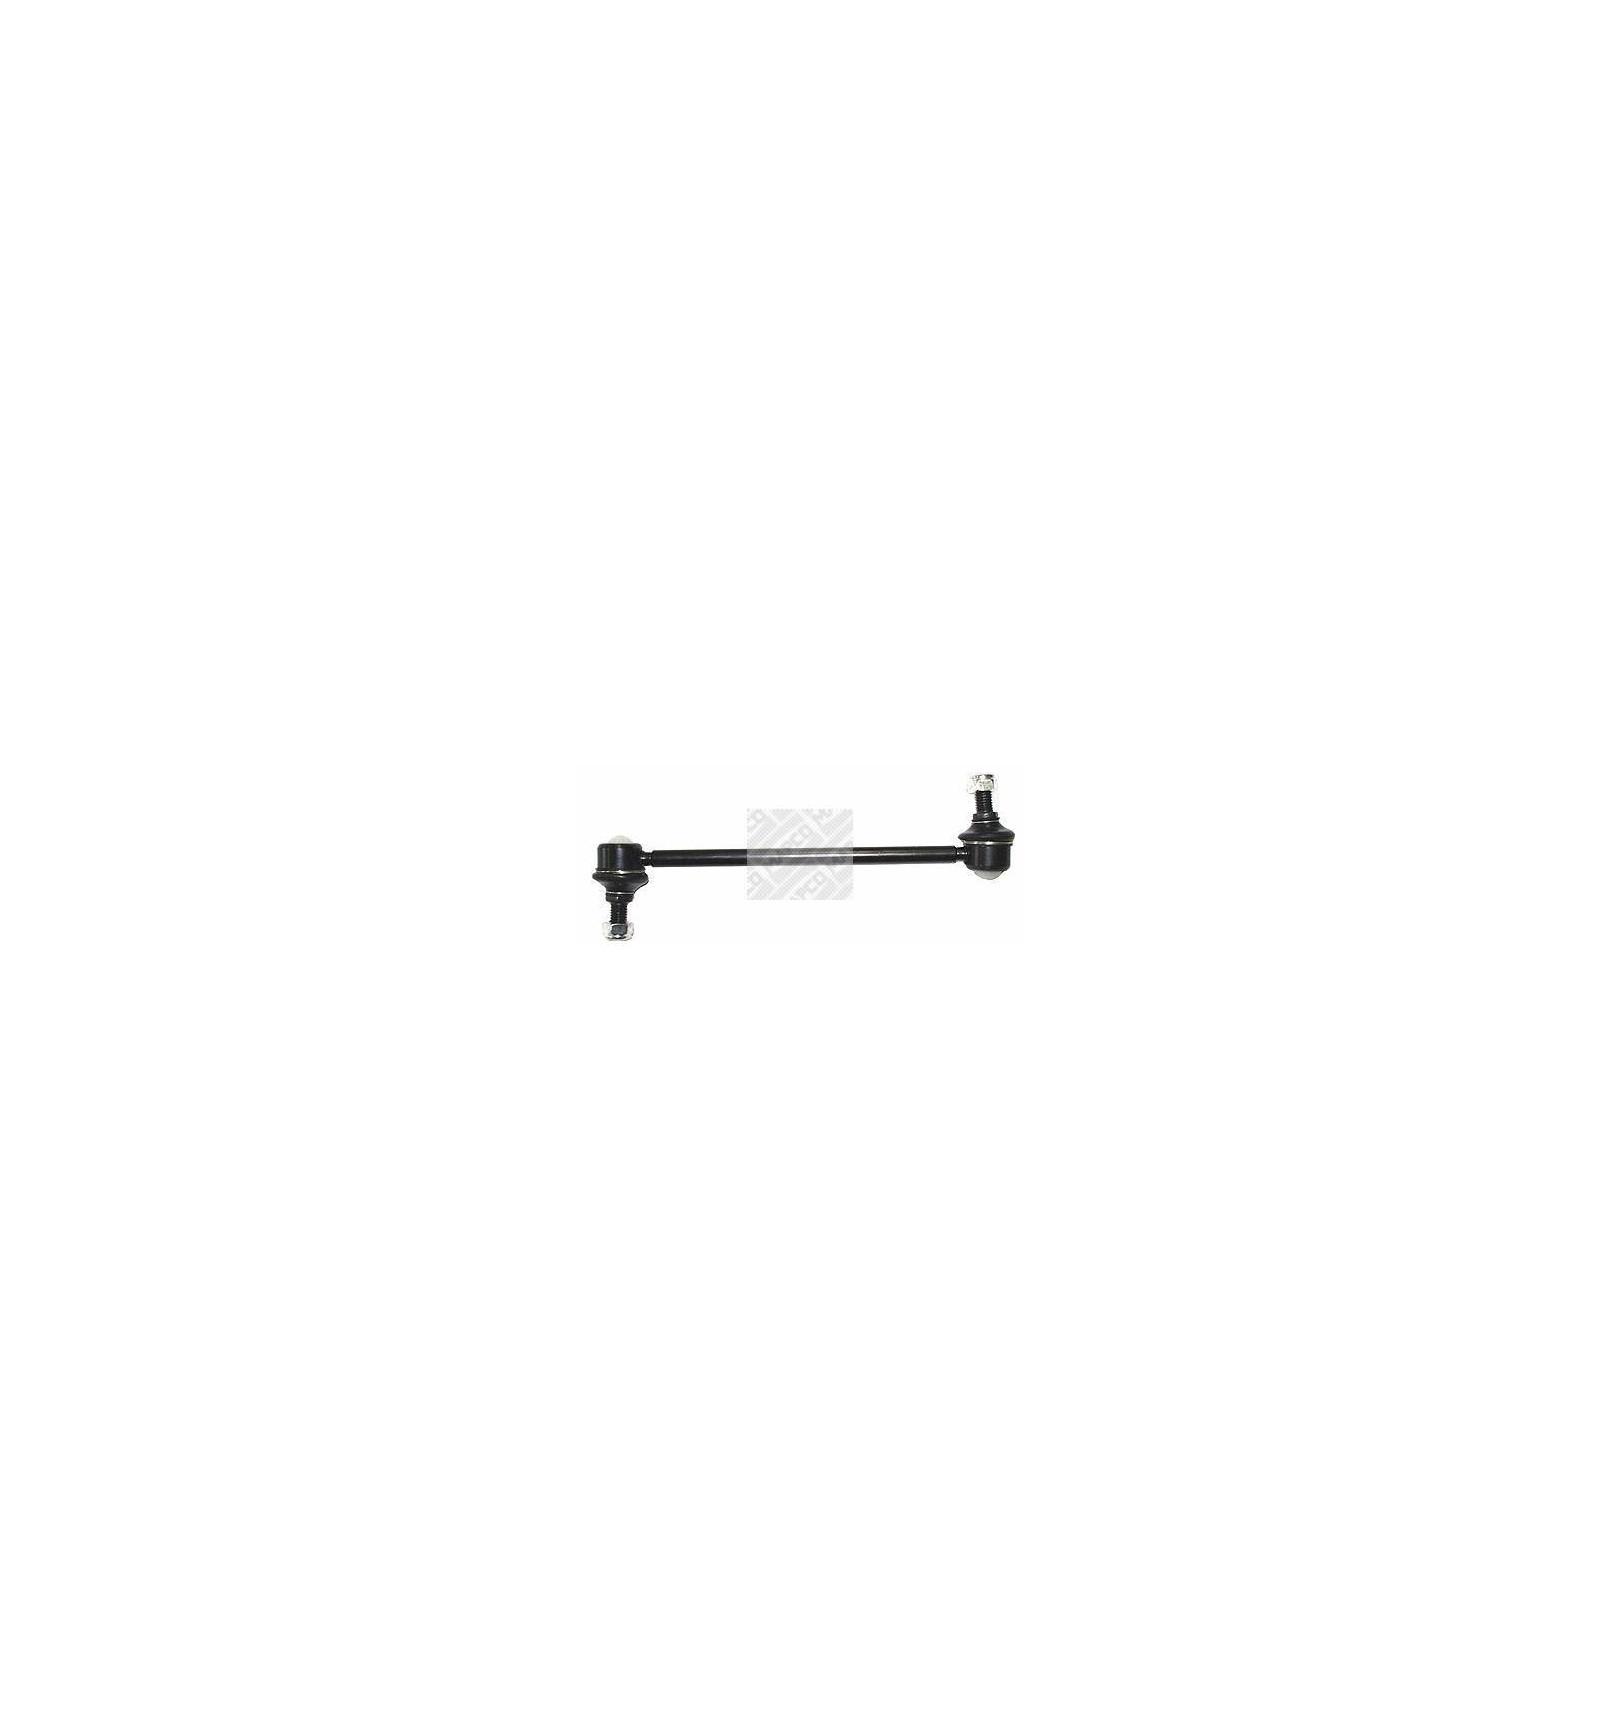 biellette de suspension seat alhambra ford galaxy vw sharan. Black Bedroom Furniture Sets. Home Design Ideas